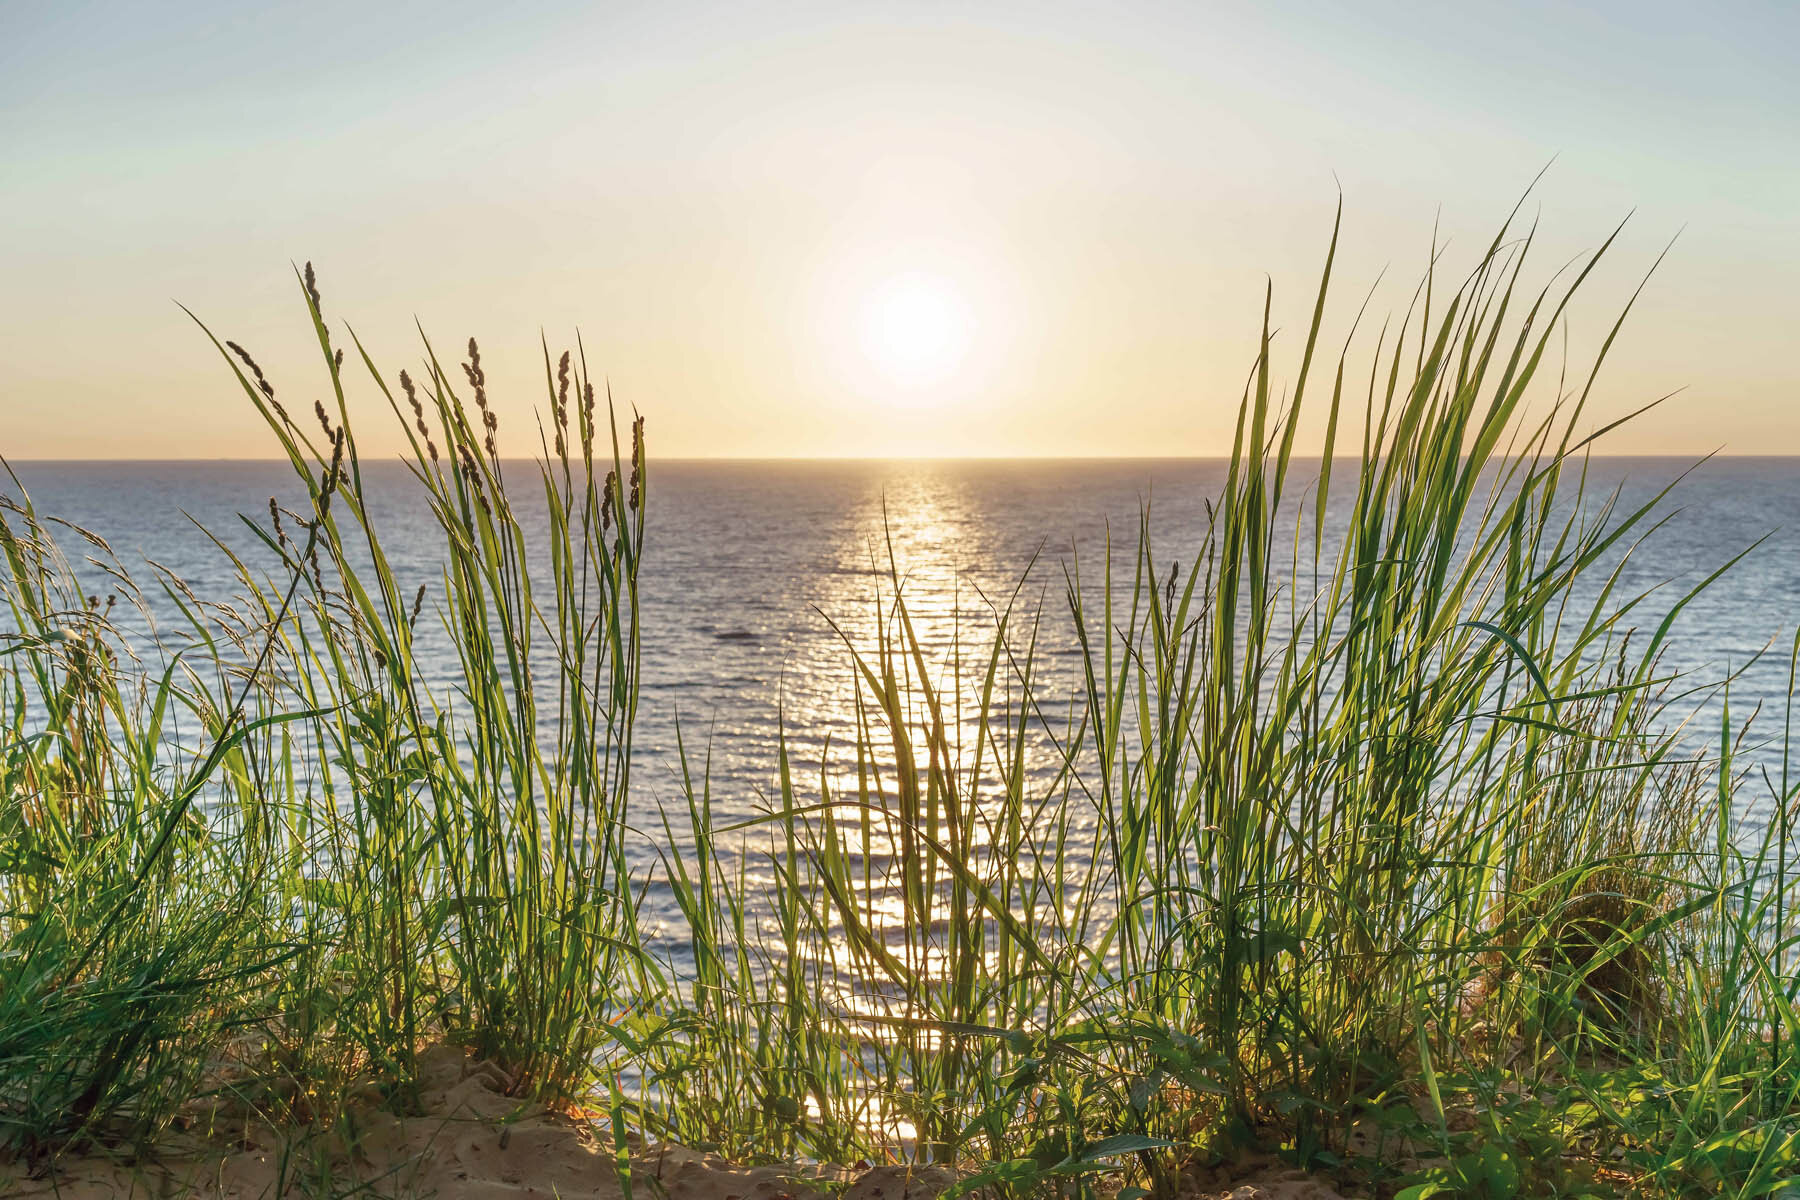 PlateART Duschrückwand mit Motiv Strand und Meer Sonnenuntergang